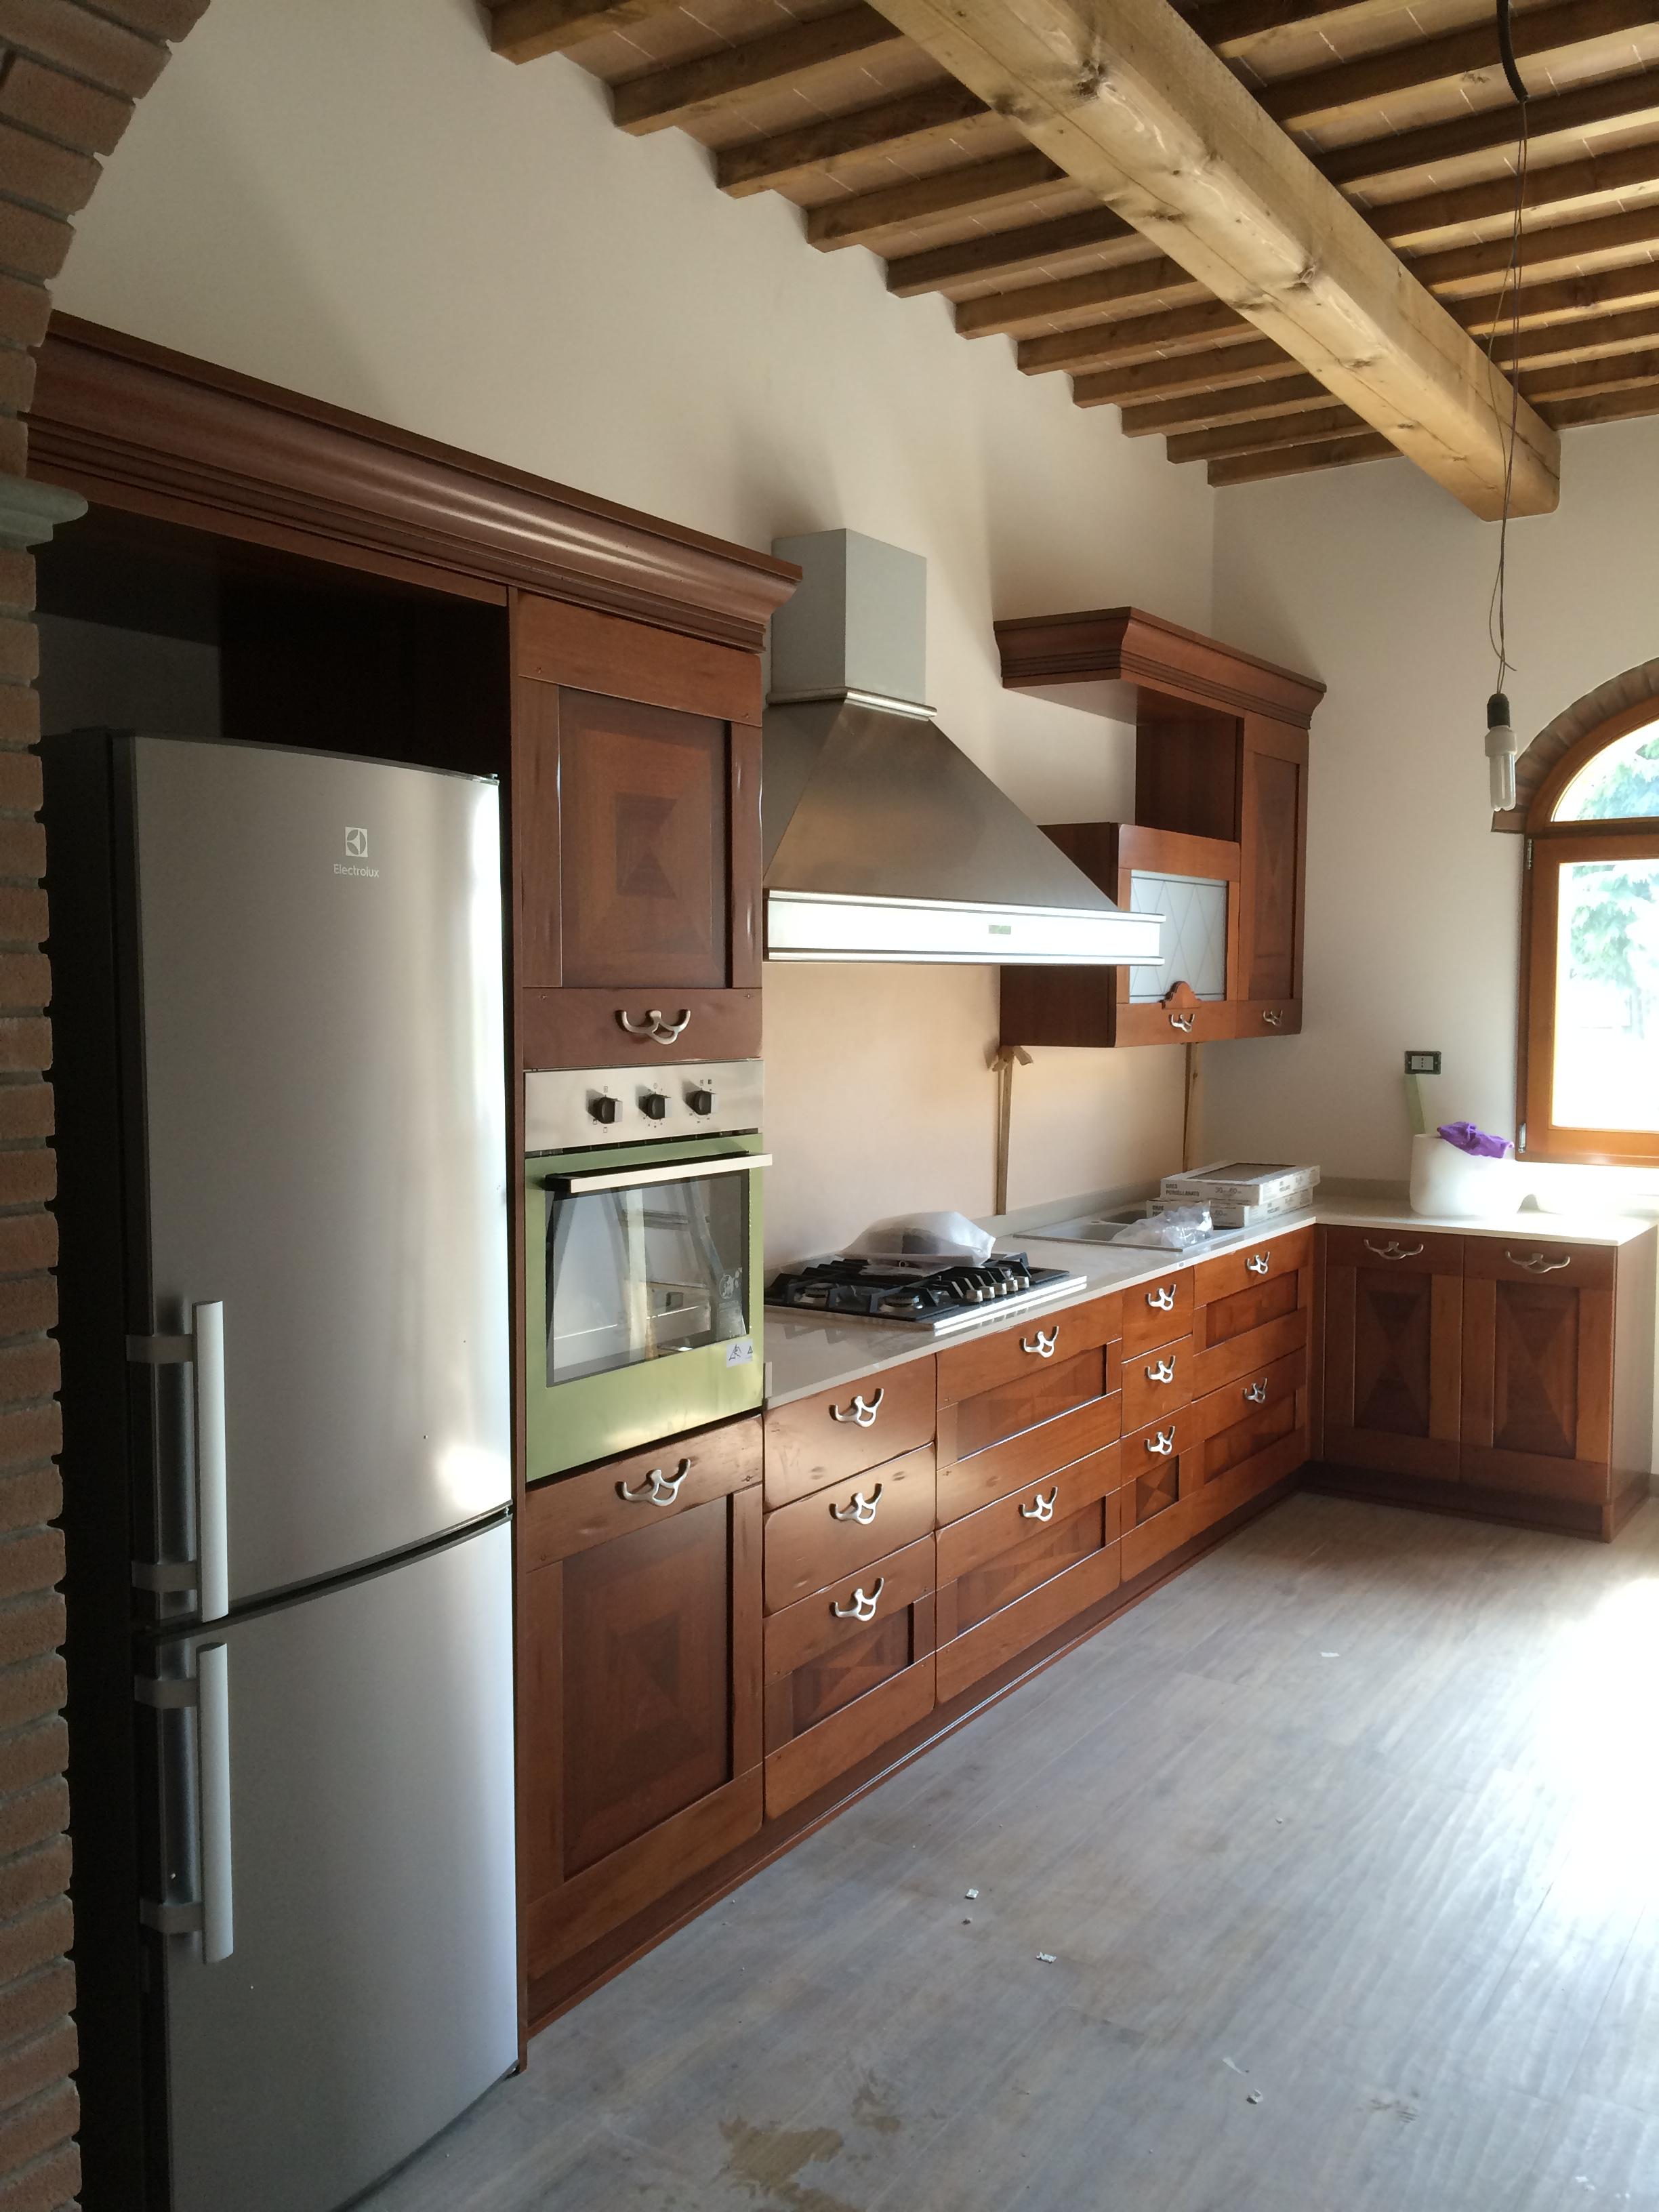 Cucina per cascinale toscano